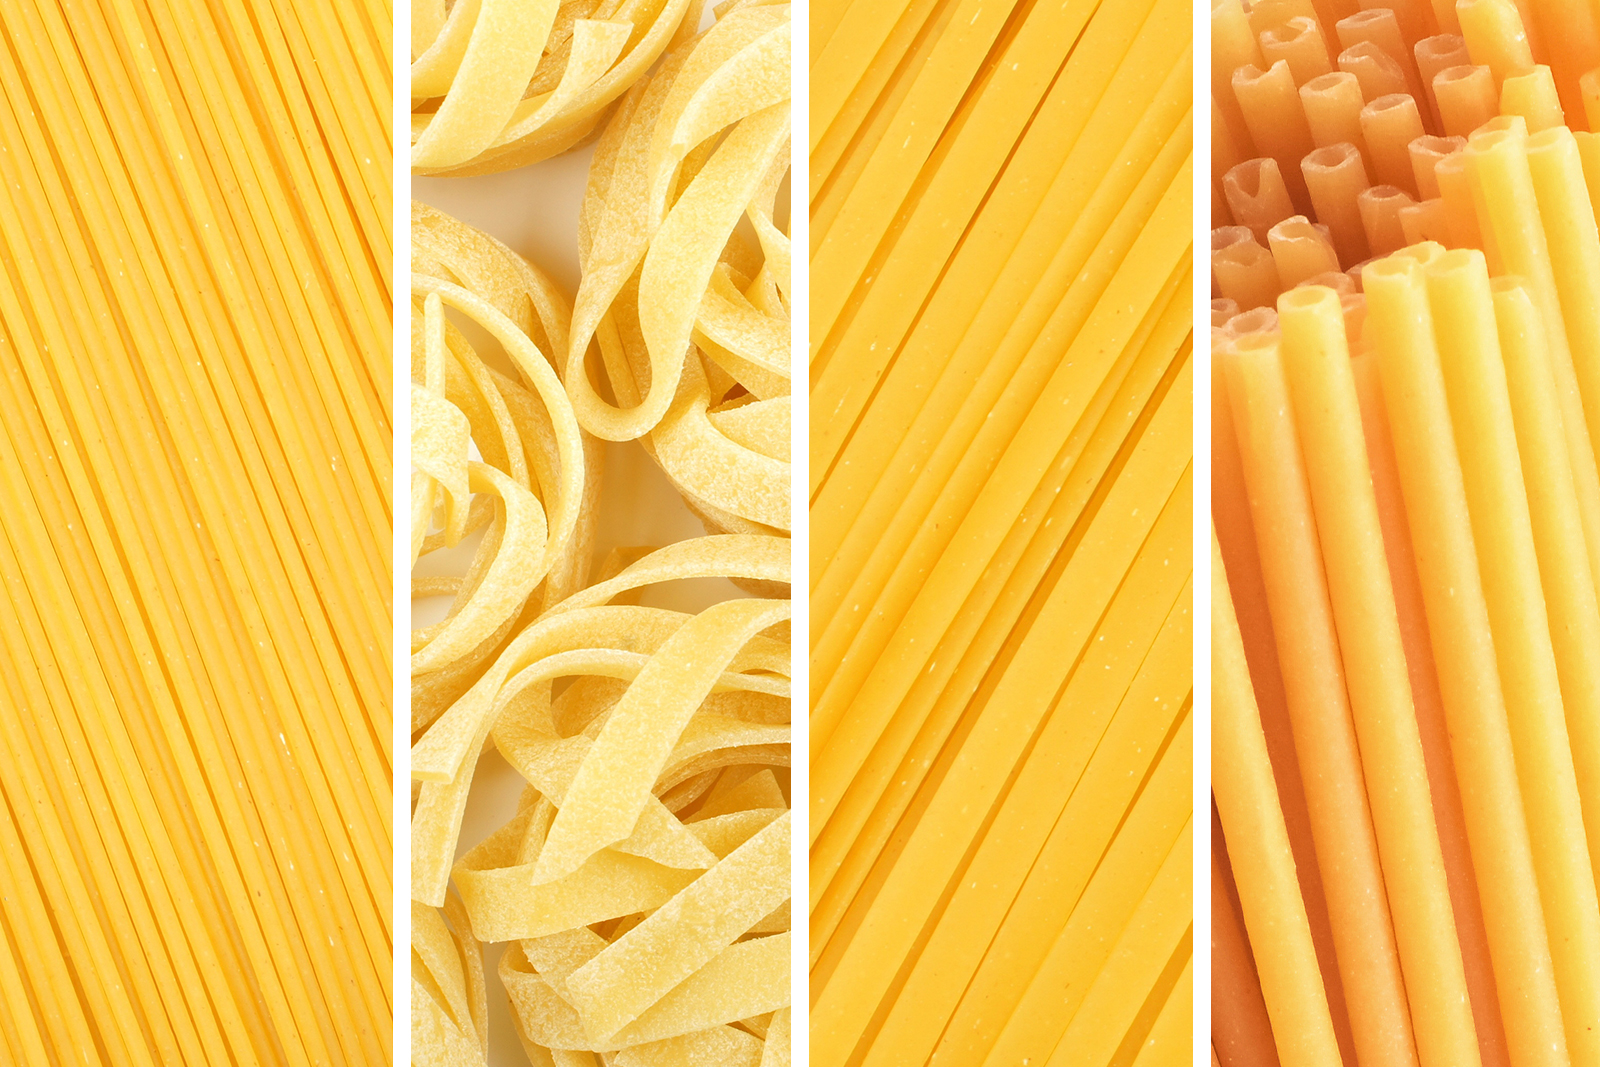 Raw pasta - Linguine, Bucatini, Fettucine, Spaghetti